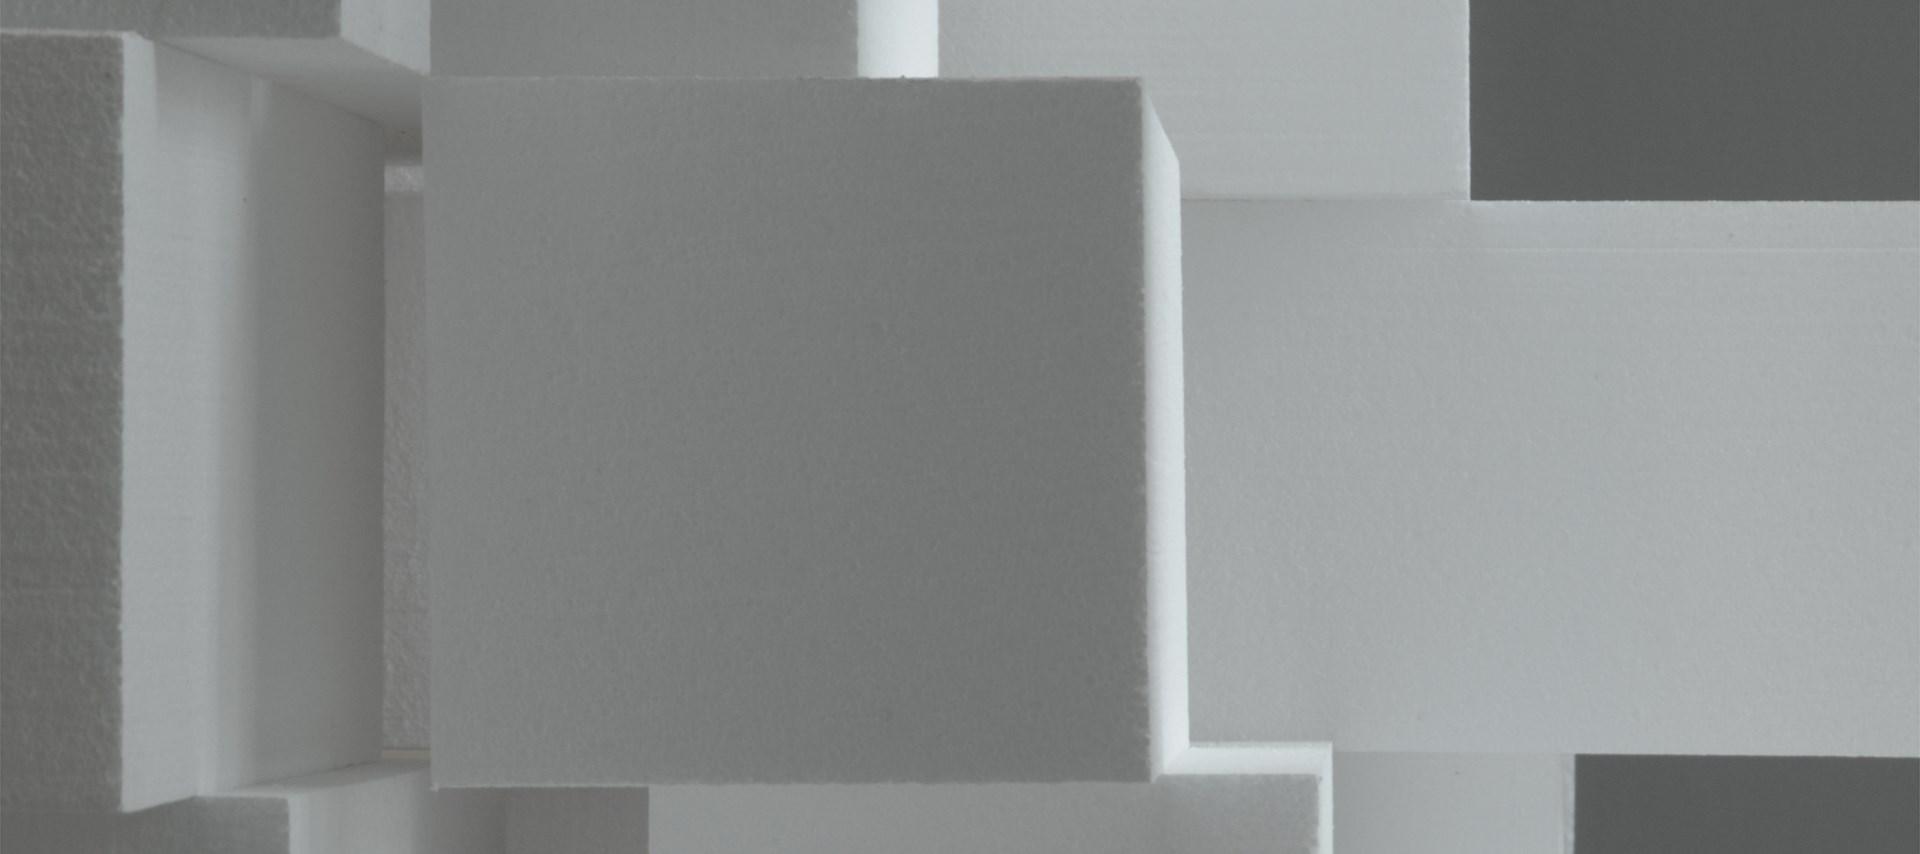 Tobias Putrih and MOS: Overhang: Installation image (03)